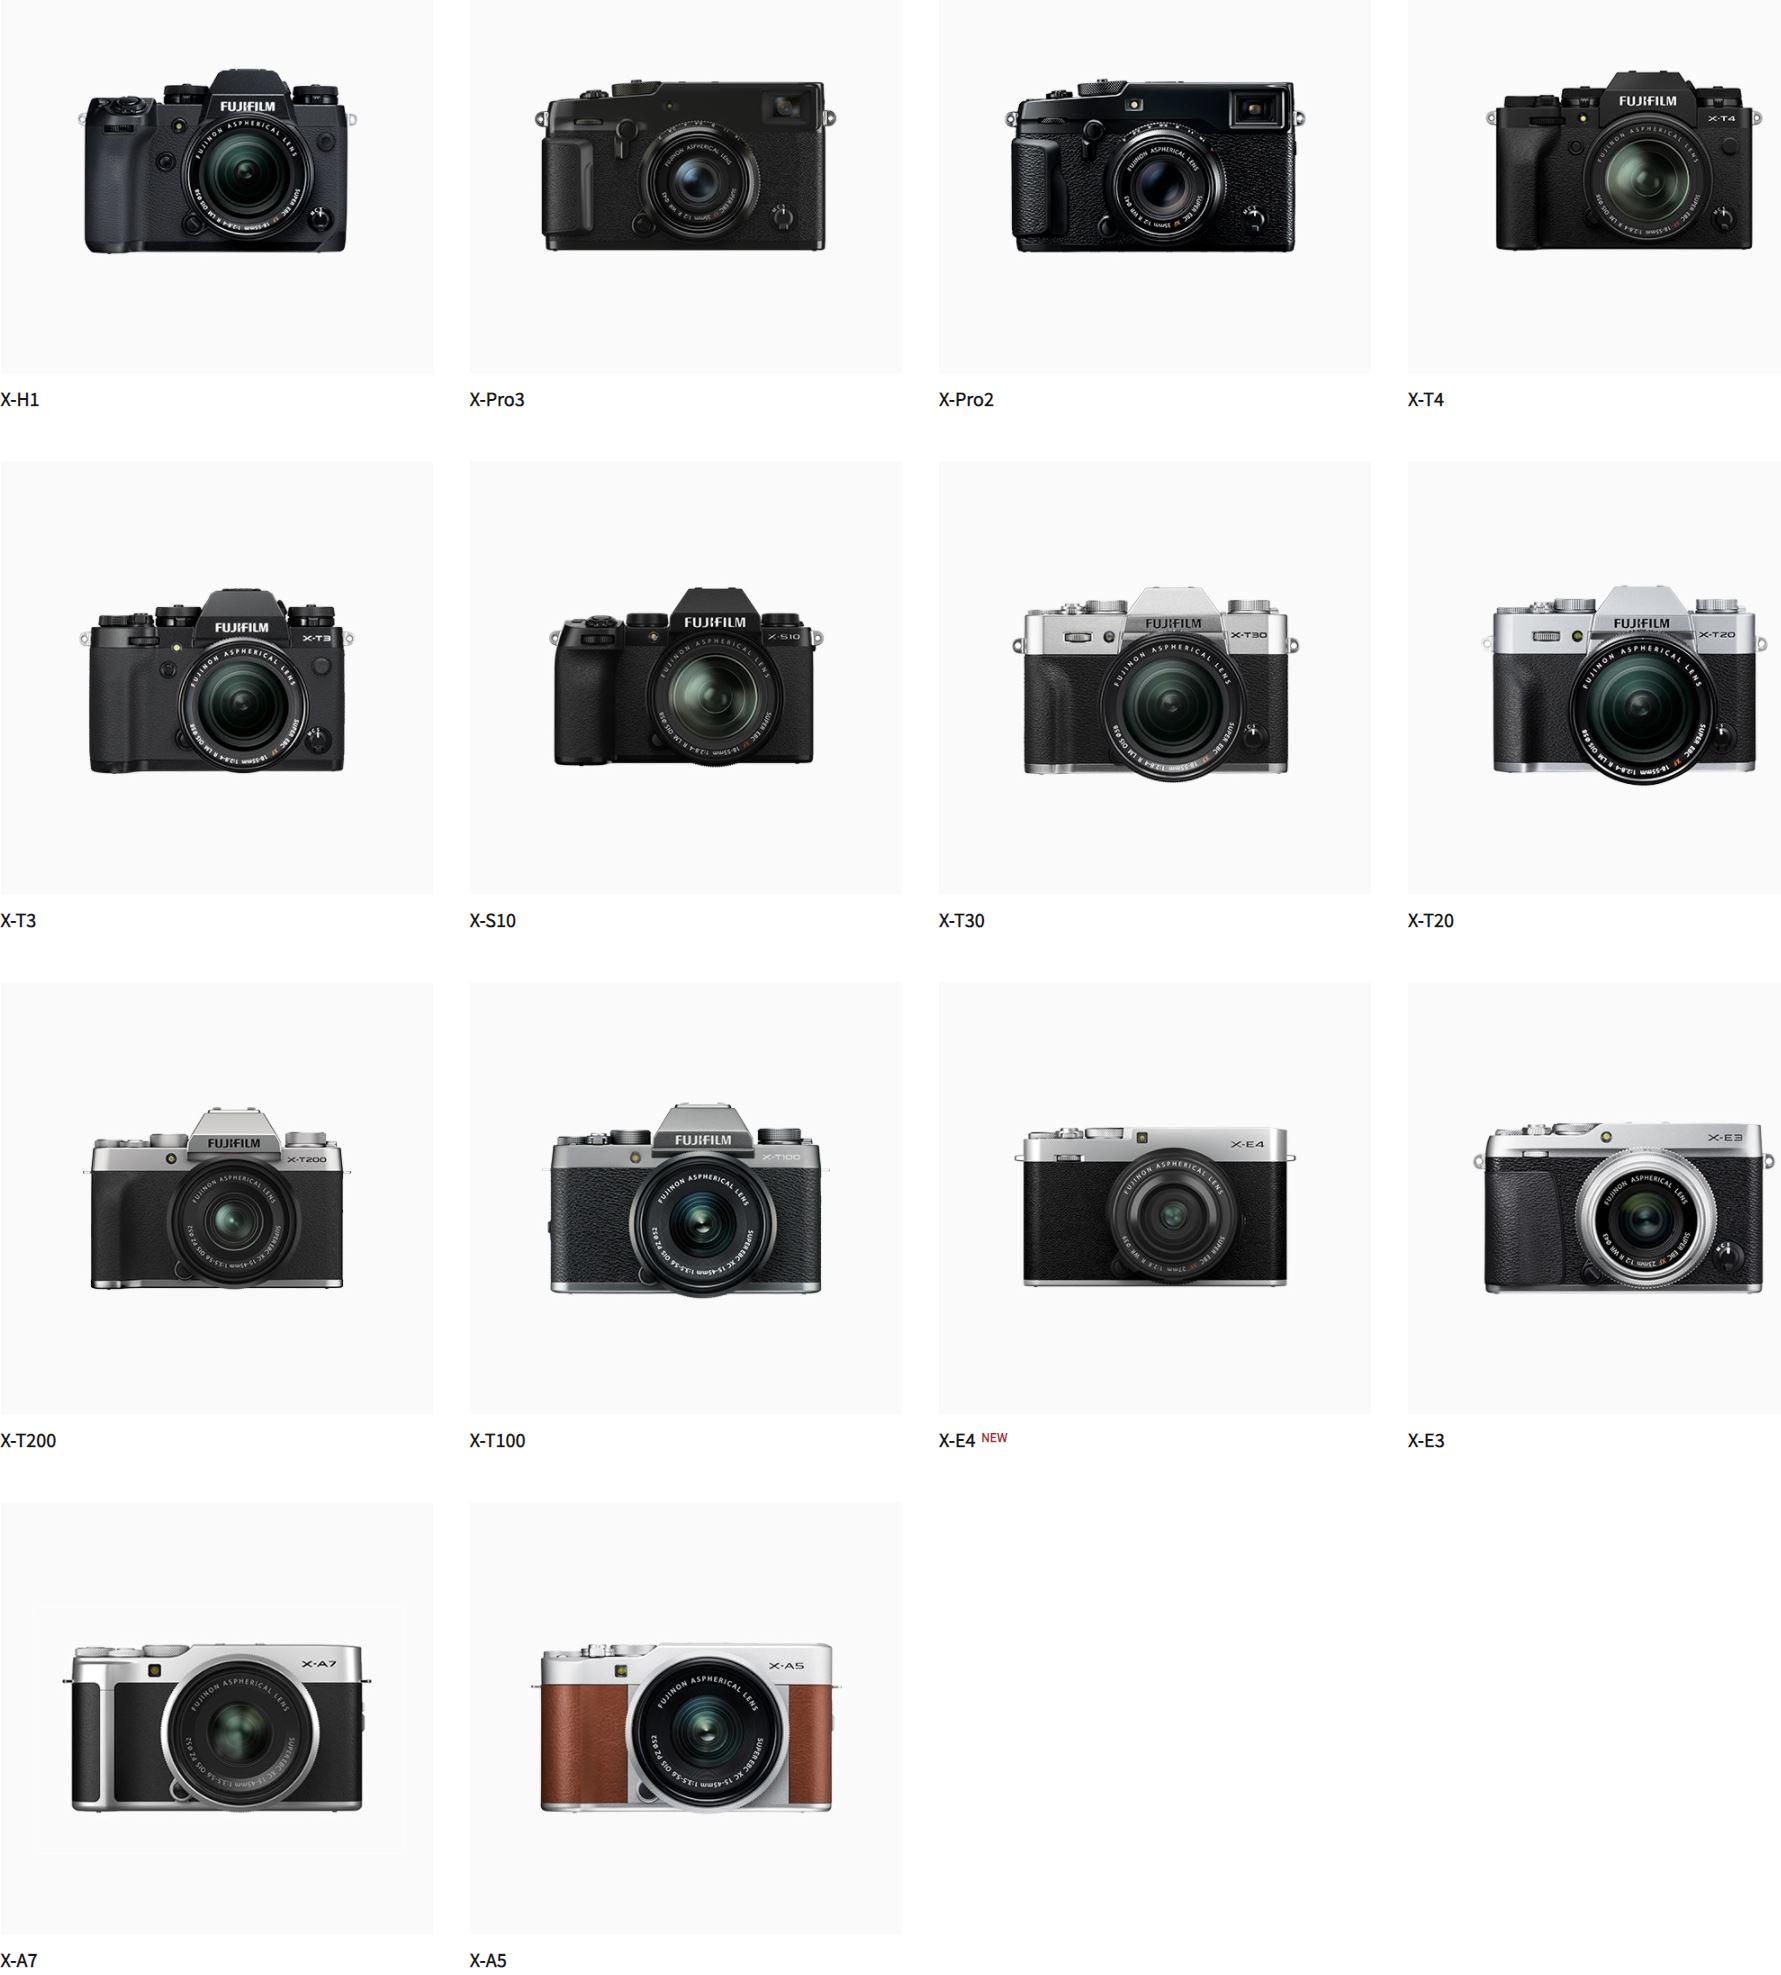 Fujifilm X-T200 ve X-E3 karşılaştırması